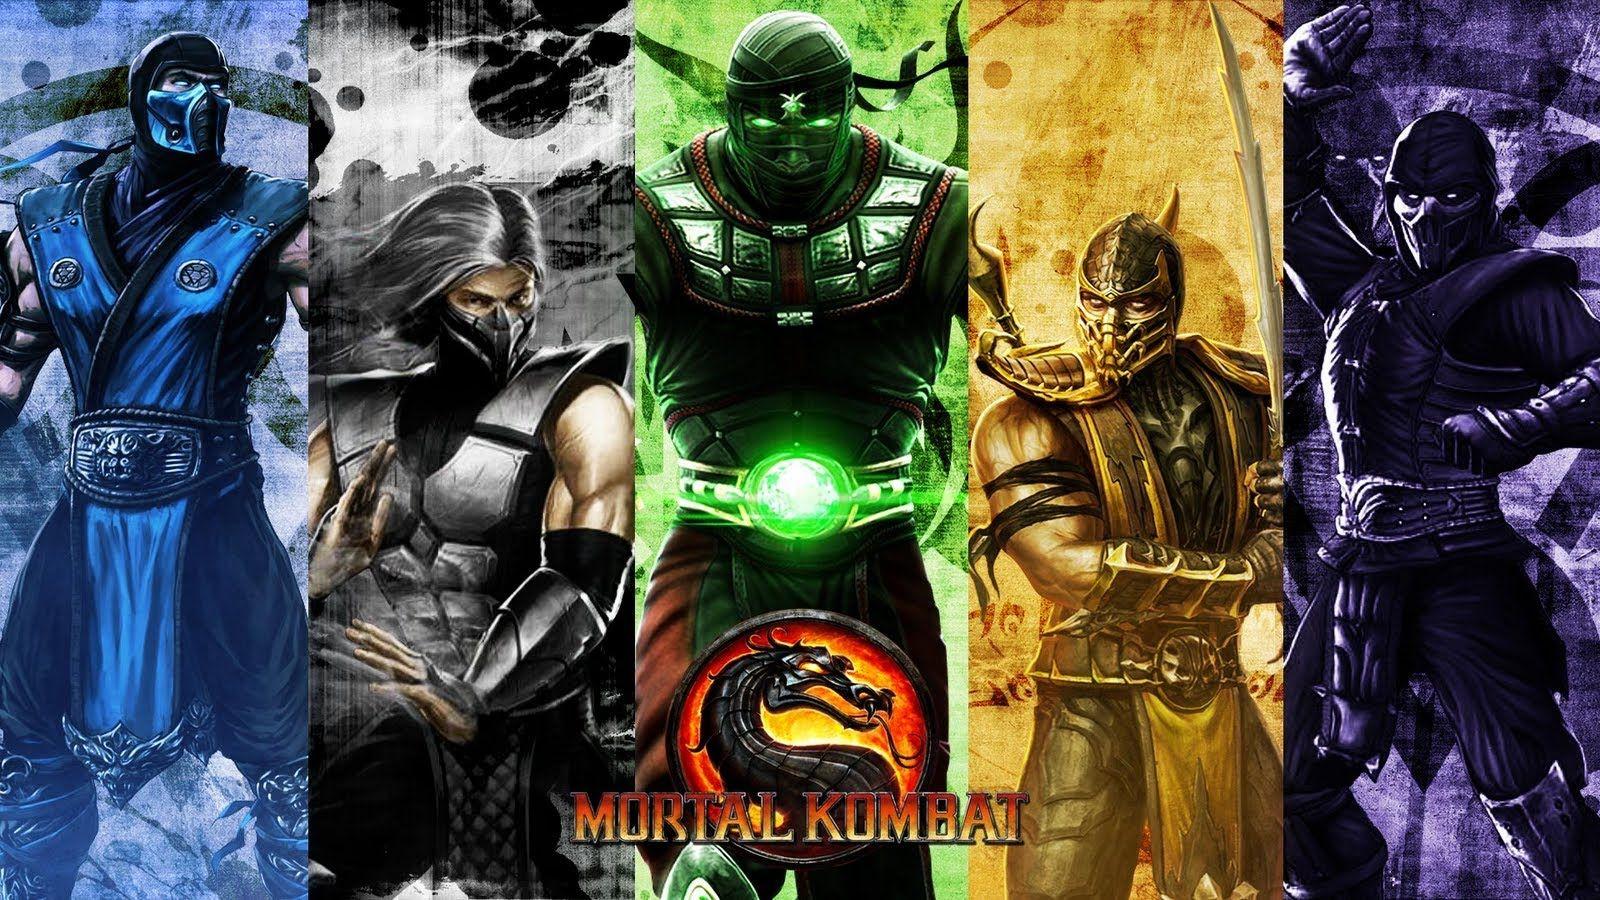 Mortal Kombat Wallpaper Mortal Kombat Mortal Kombat 9 Mortal Kombat X Wallpapers